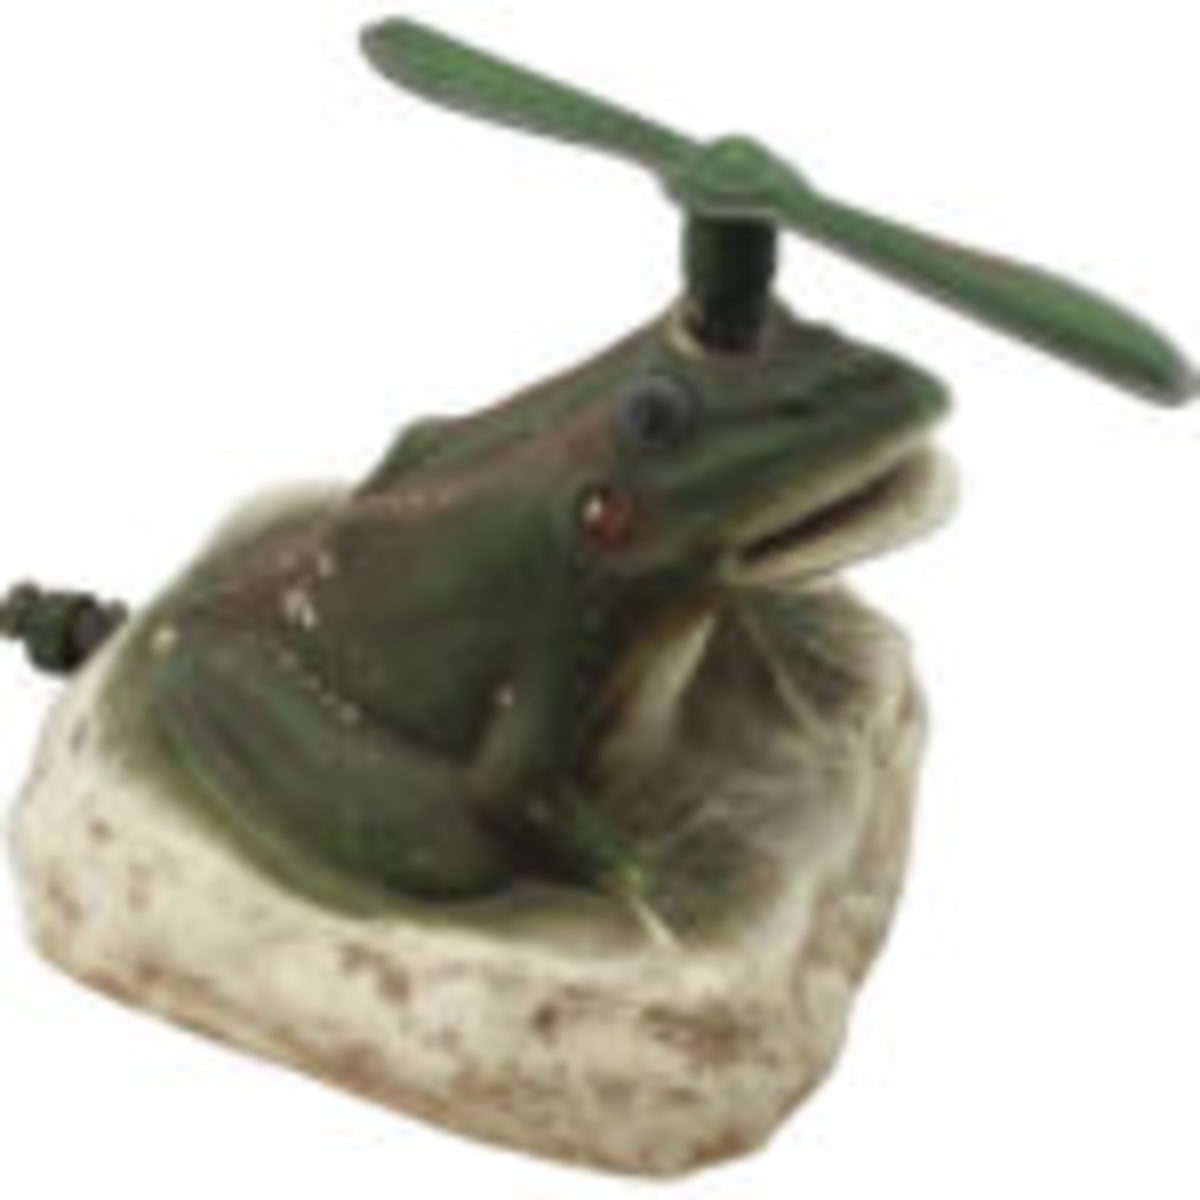 ceramic figural frog lawn sprinkler